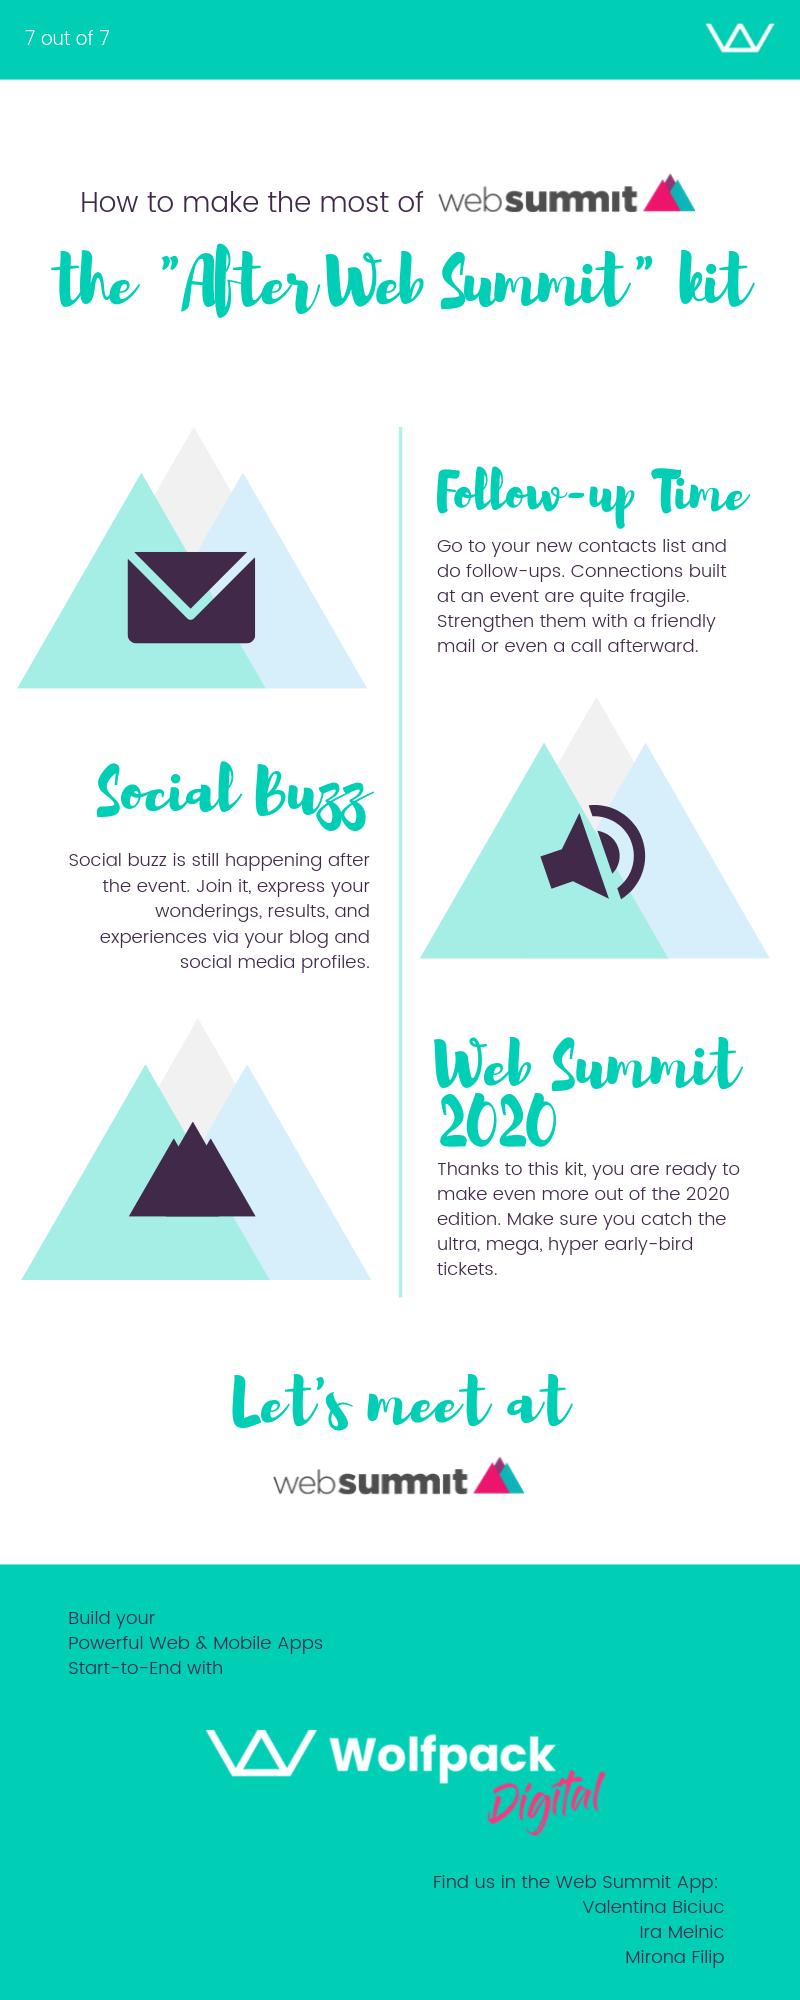 Web Summit, Web Summit 2020, 2020 edition, experiences at web summit, Wolfpack Digital, top app development team